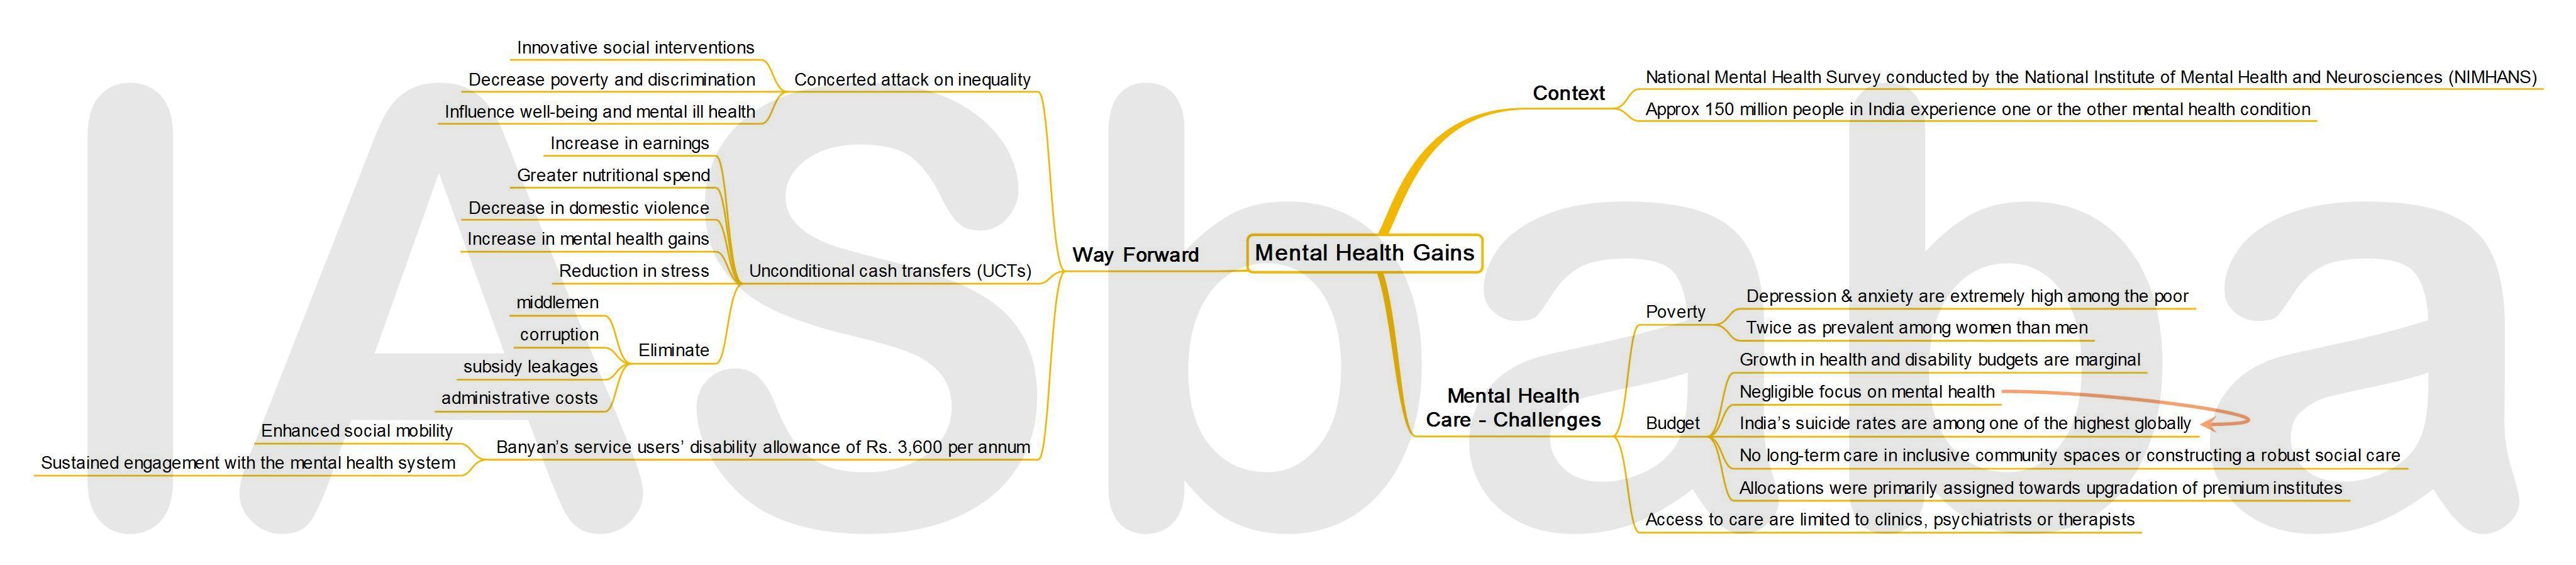 IASbaba's MINDMAP : Issue - Mental Health Gains